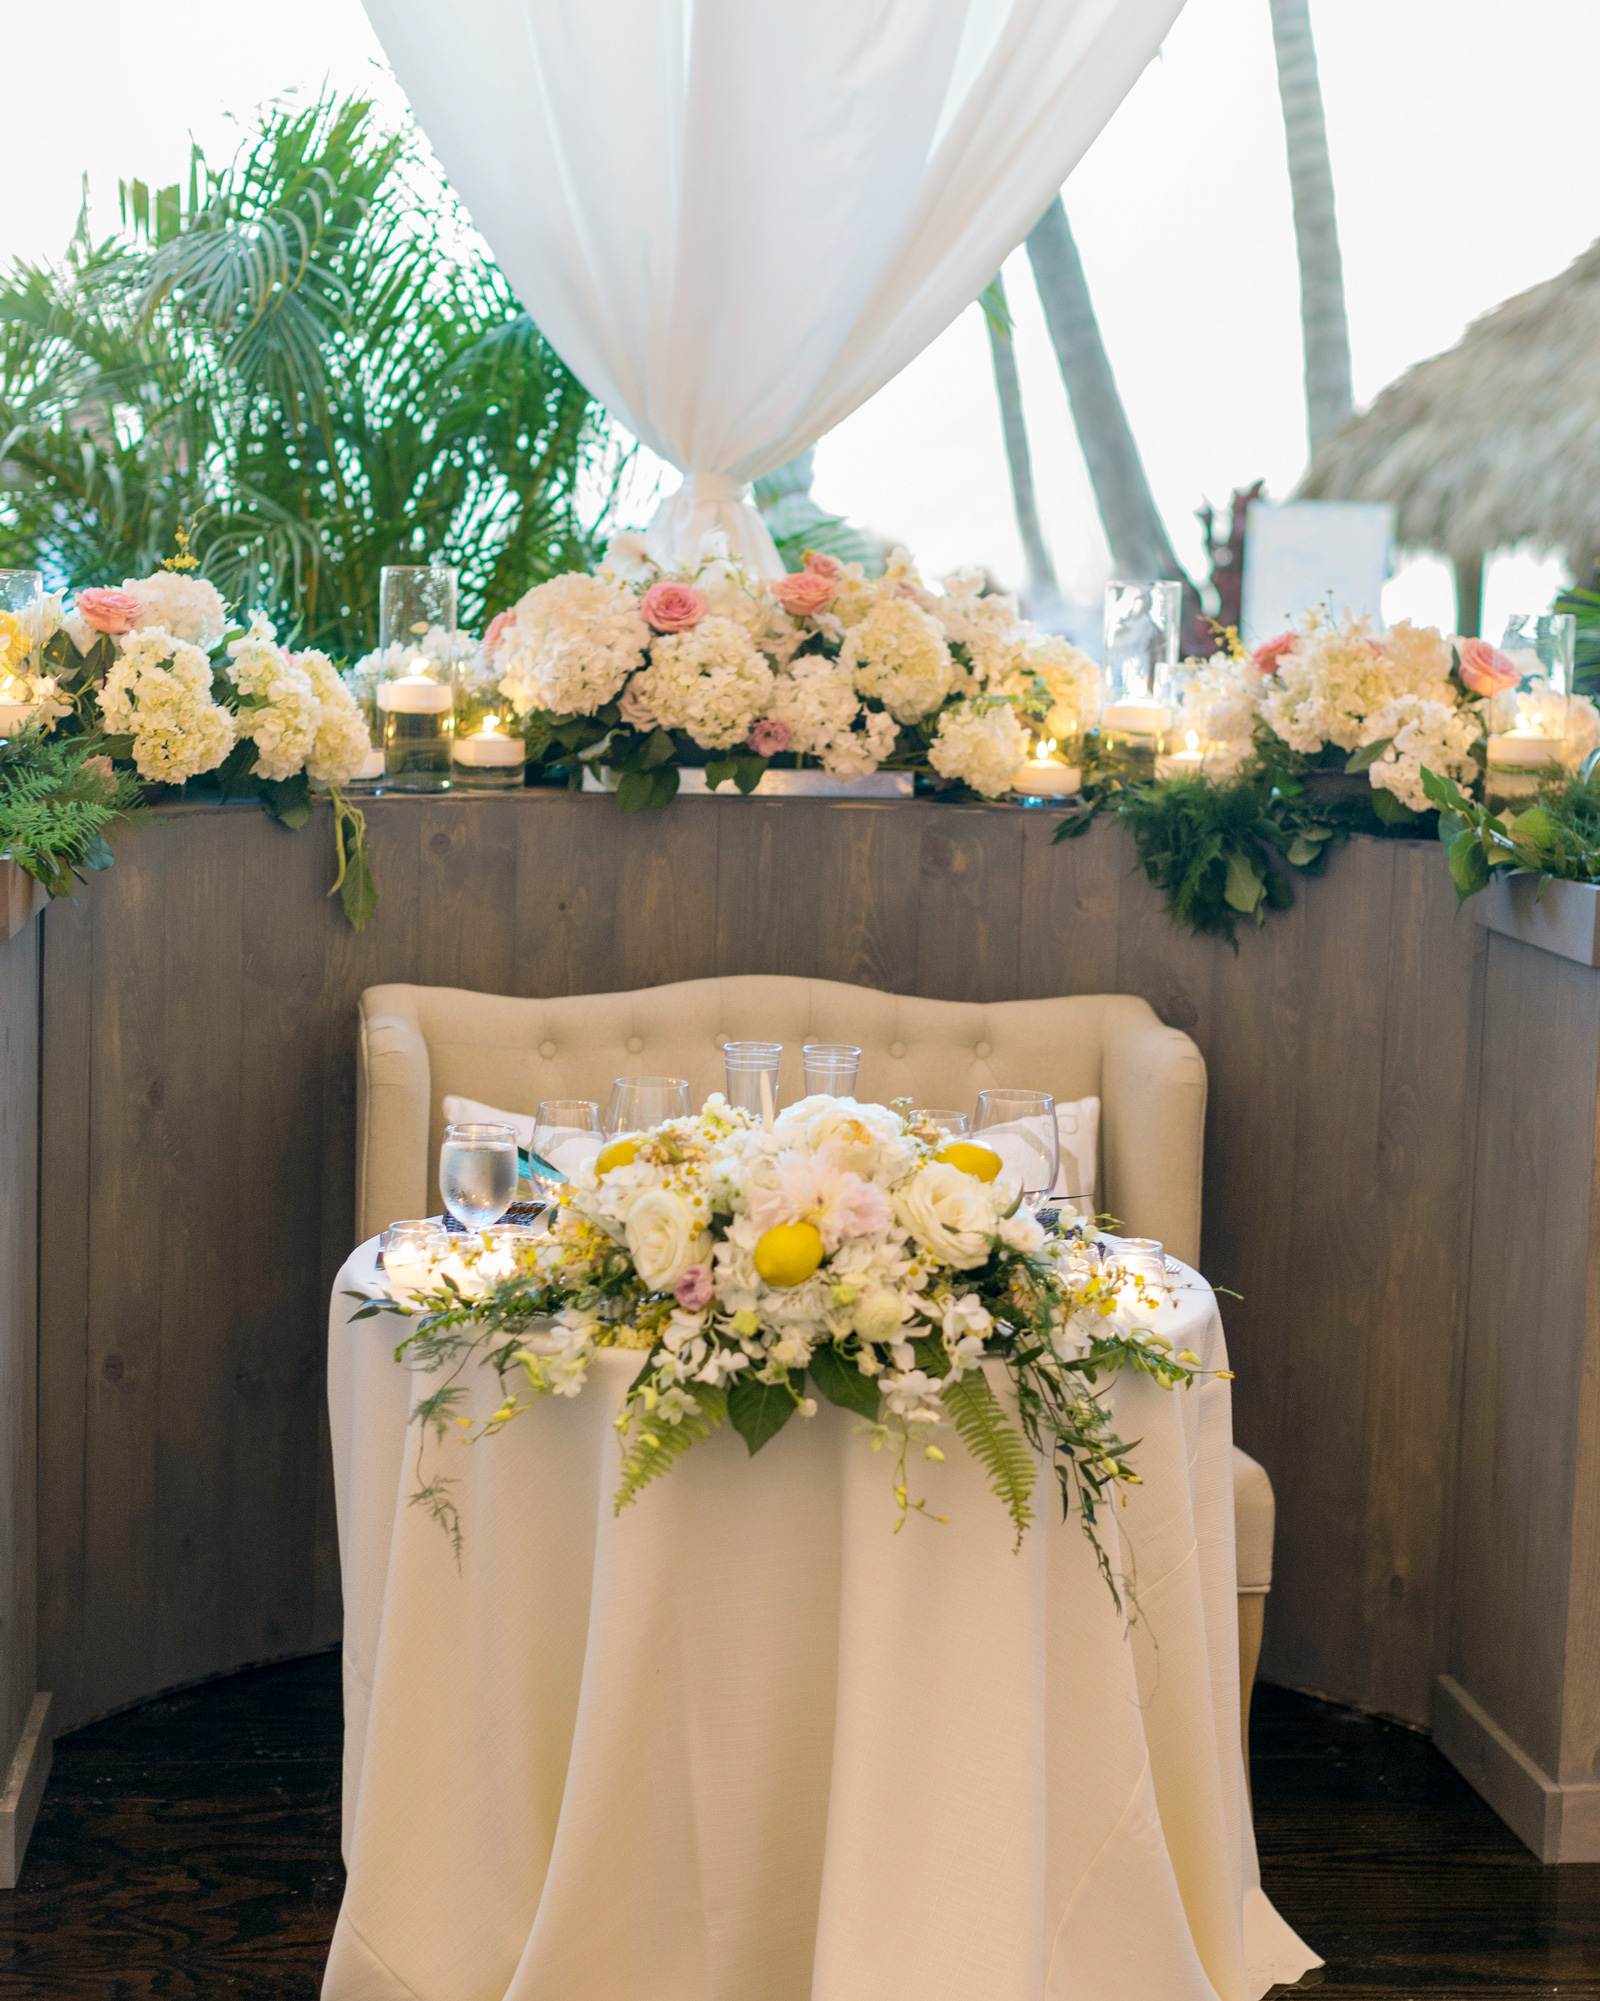 erin-ryan-florida-wedding-sweetheart-table-1111-s113010-0516.jpg